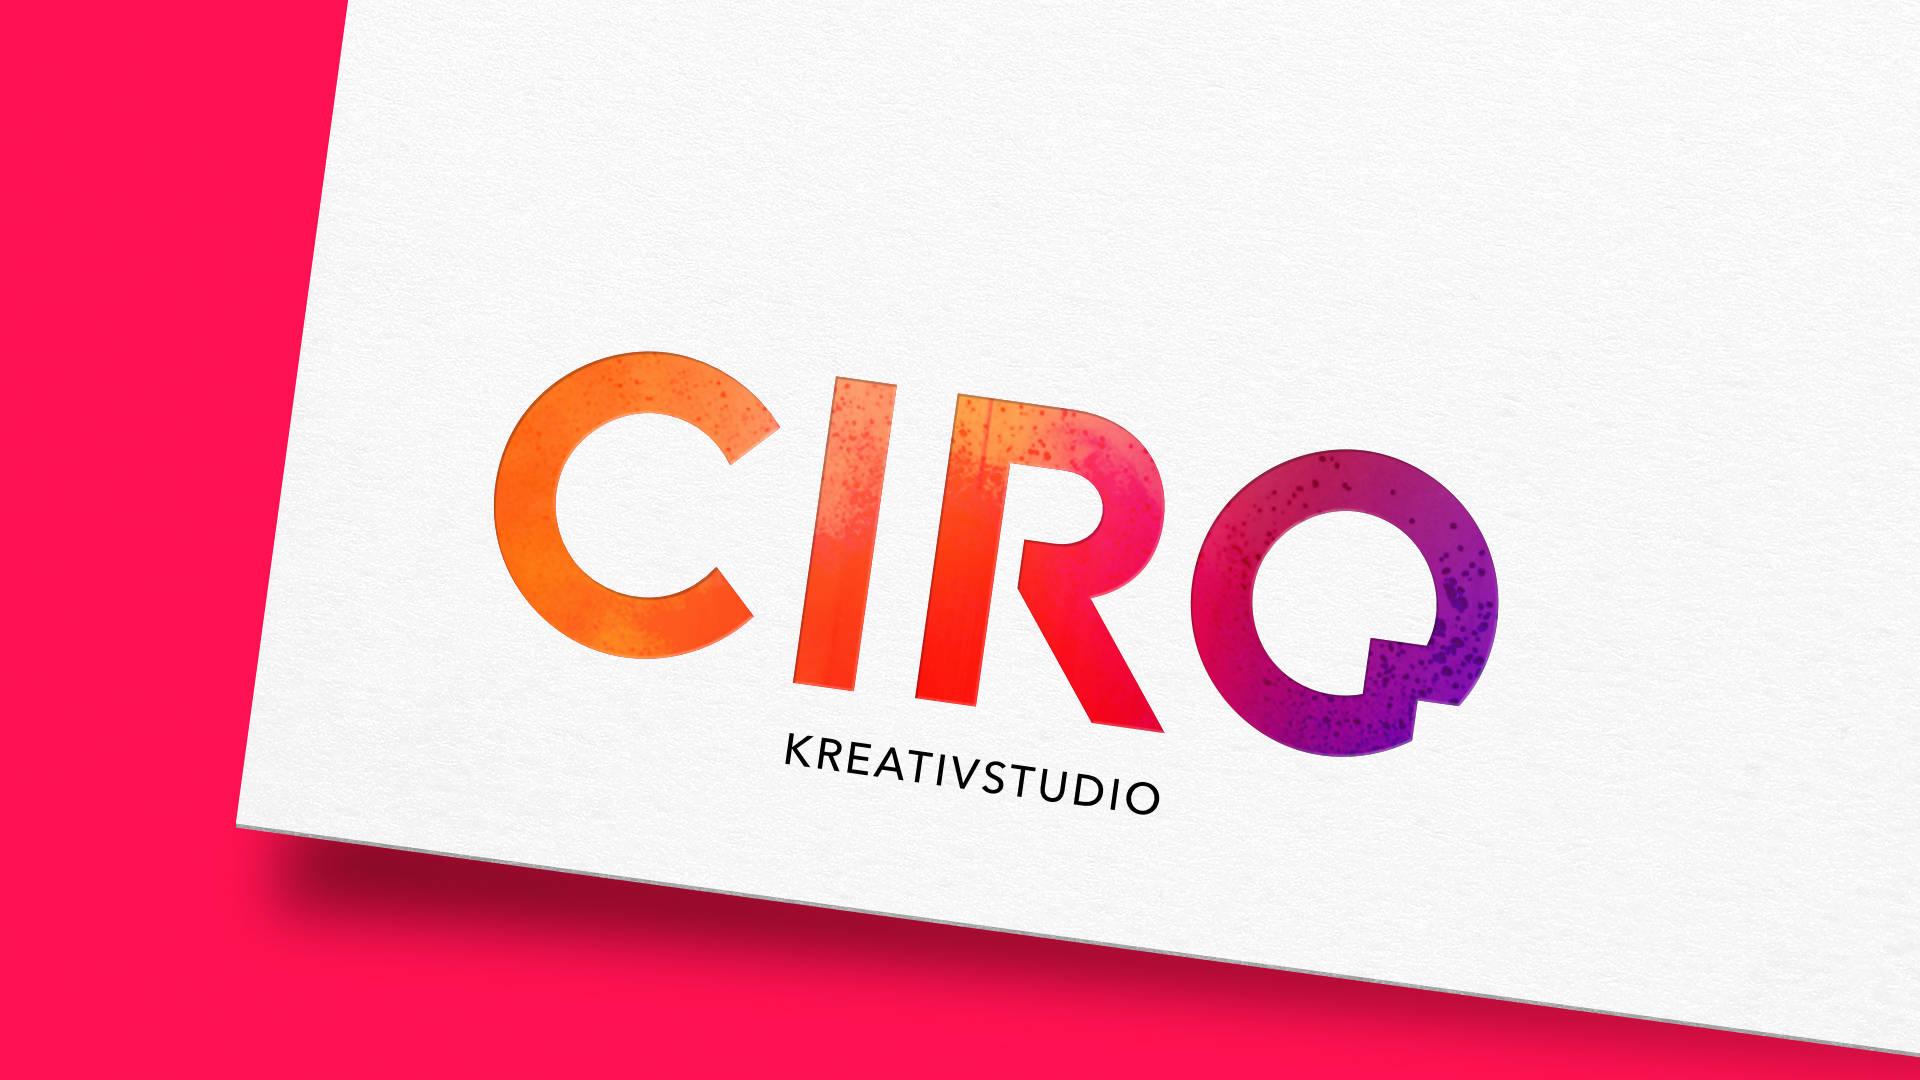 CIRQ – Kreativstudio